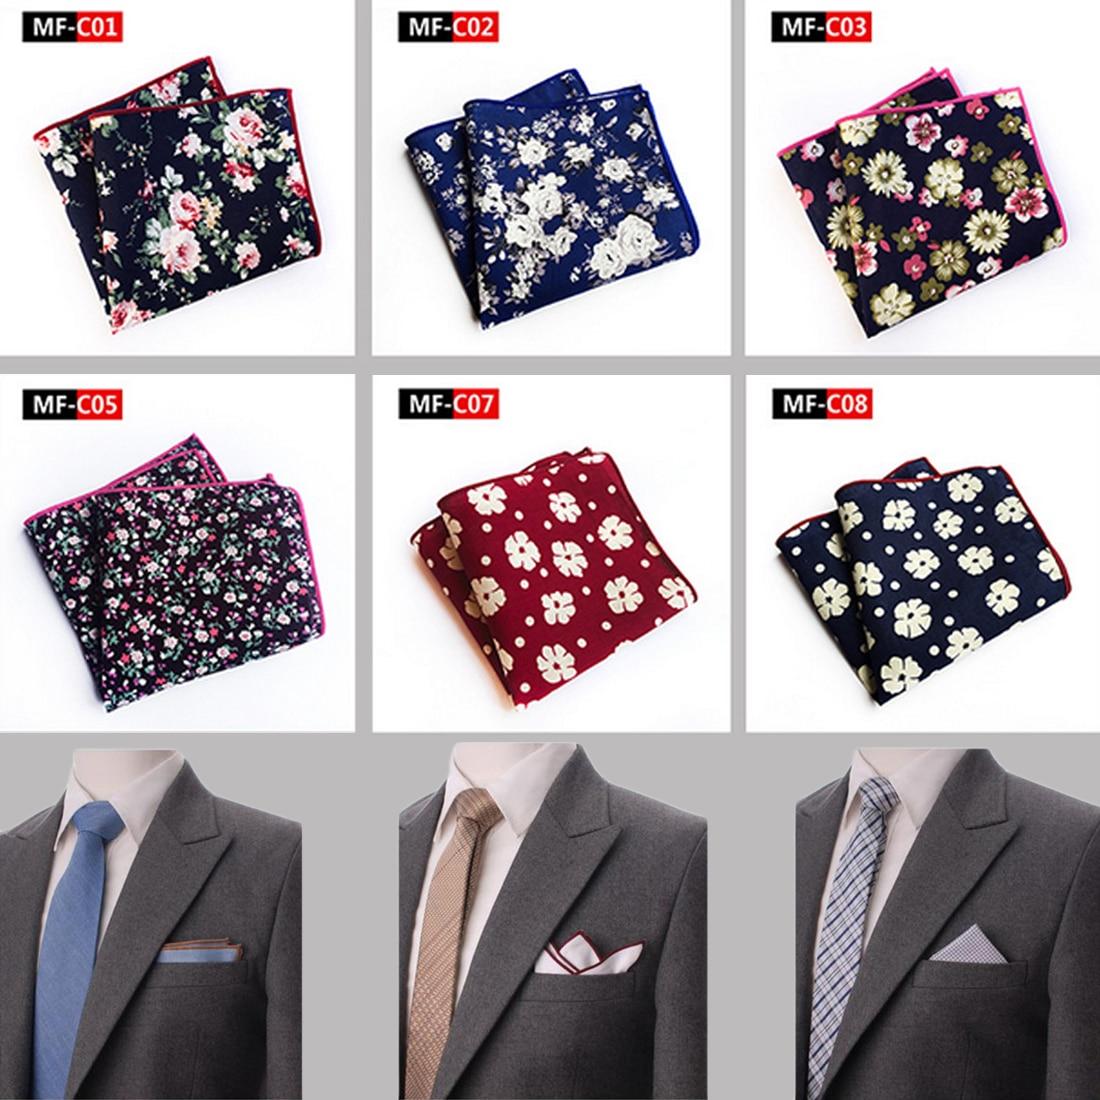 New Men's Cotton Pocket Square Western Style Floral Handkerchief For Suit Pocket Wedding Square Paisley 25x25cm